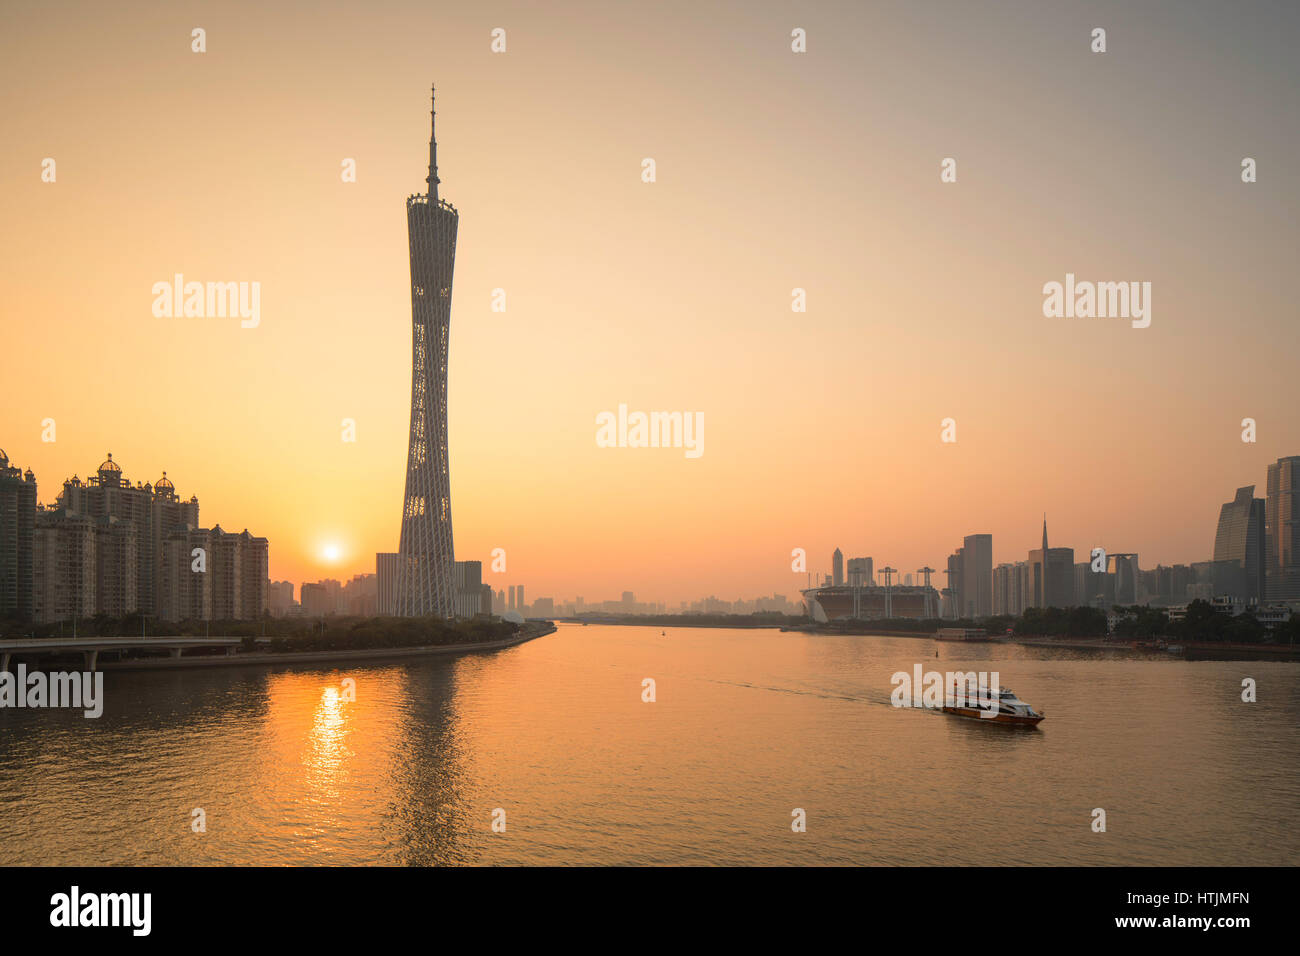 Canton Tower at sunset, Tianhe, Guangzhou, Guangdong, China - Stock Image